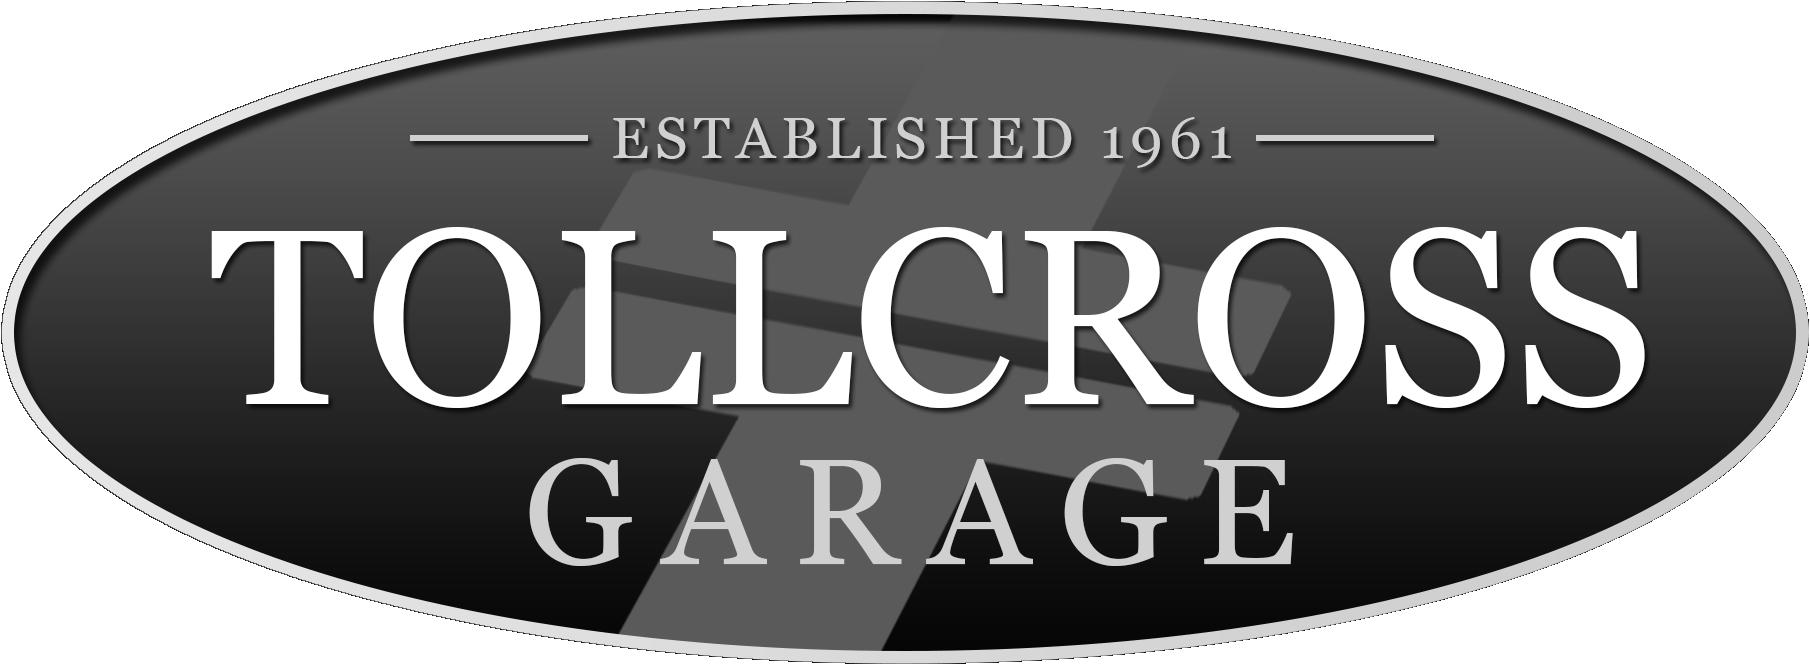 Tollcross Garage (1961) Ltd